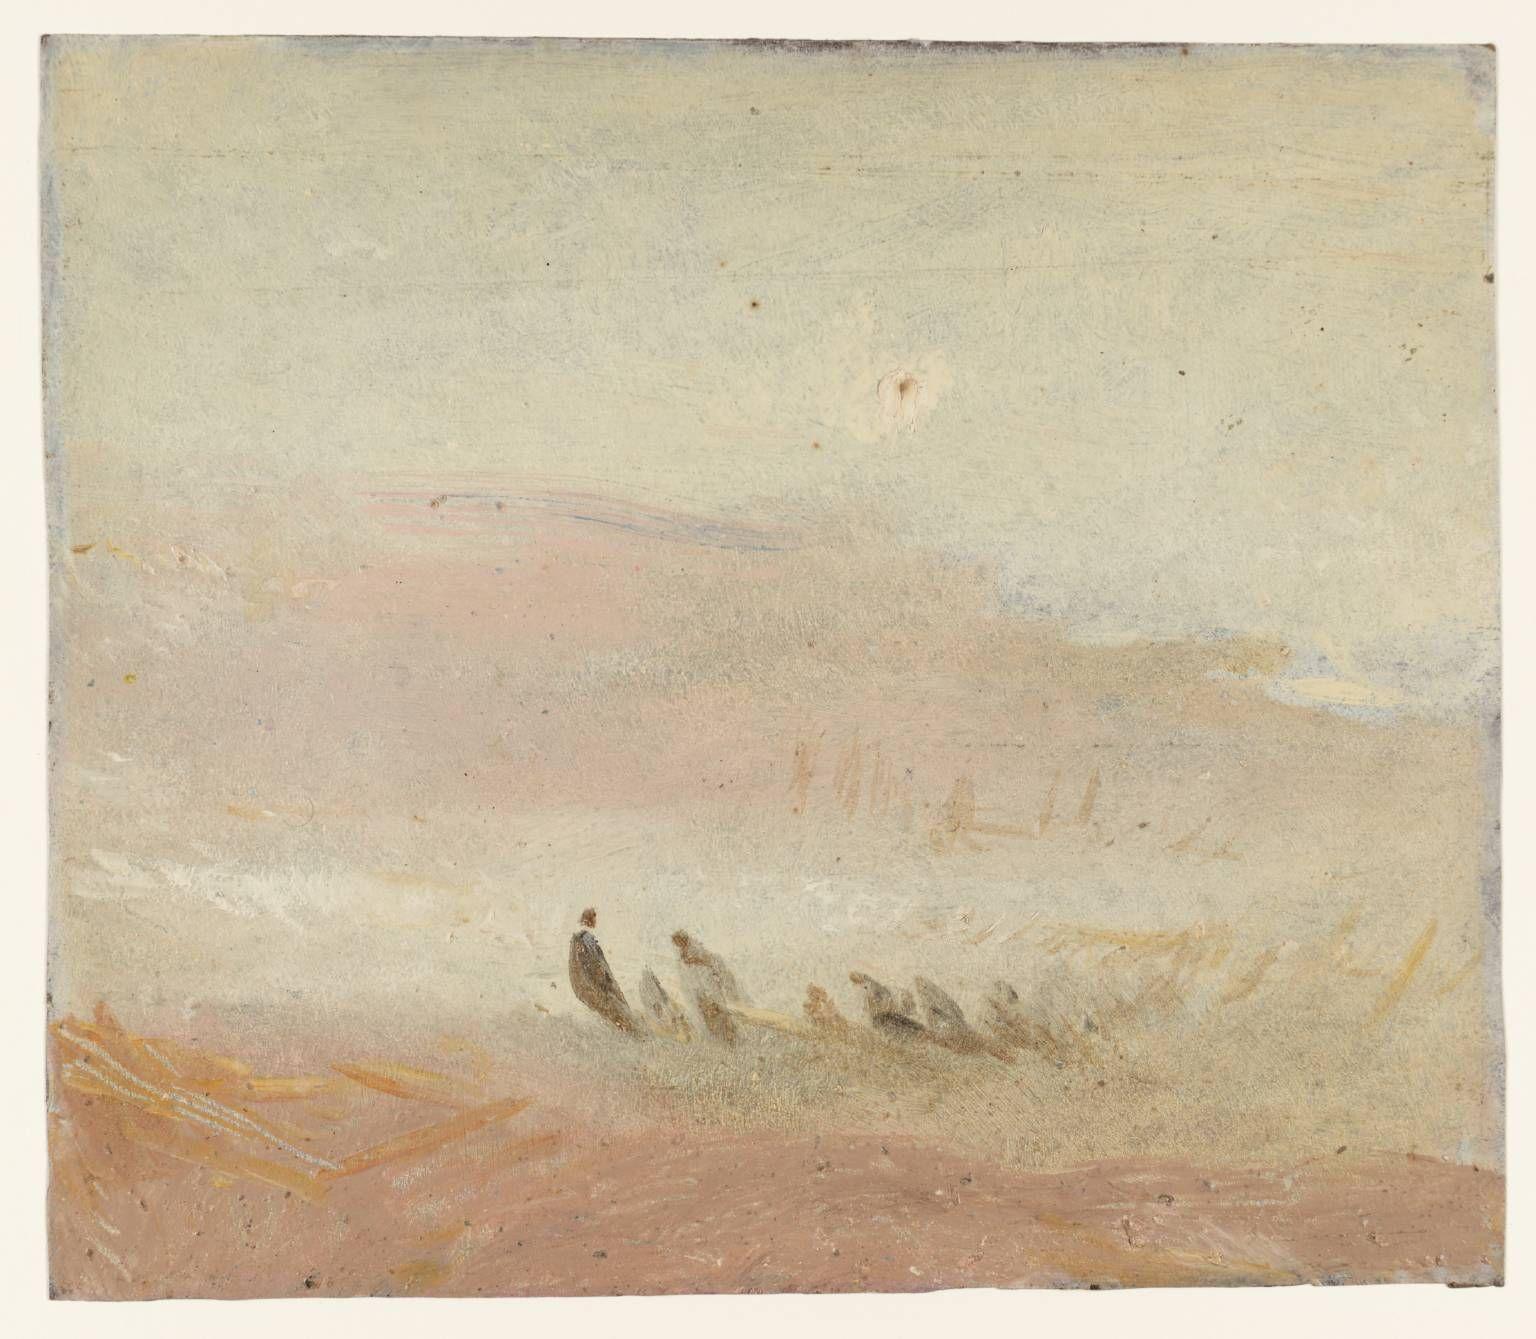 Joseph Mallord William Turner, 'Figures on a Beach' c.1840–5